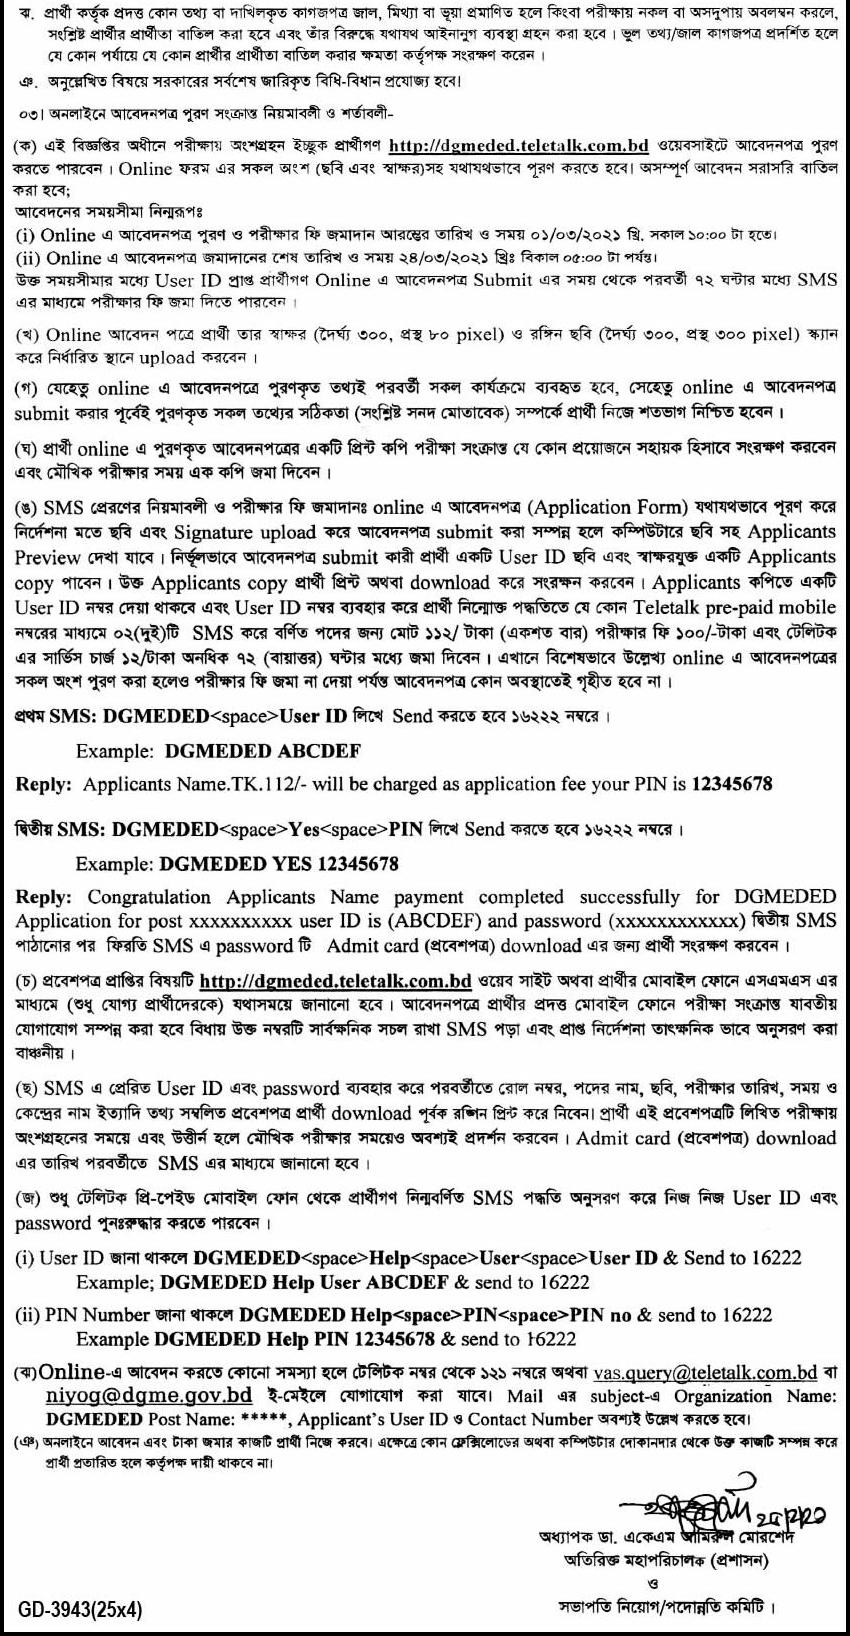 DGMEDED Teletalk 2021 - dgmeded.teletalk.com.bd